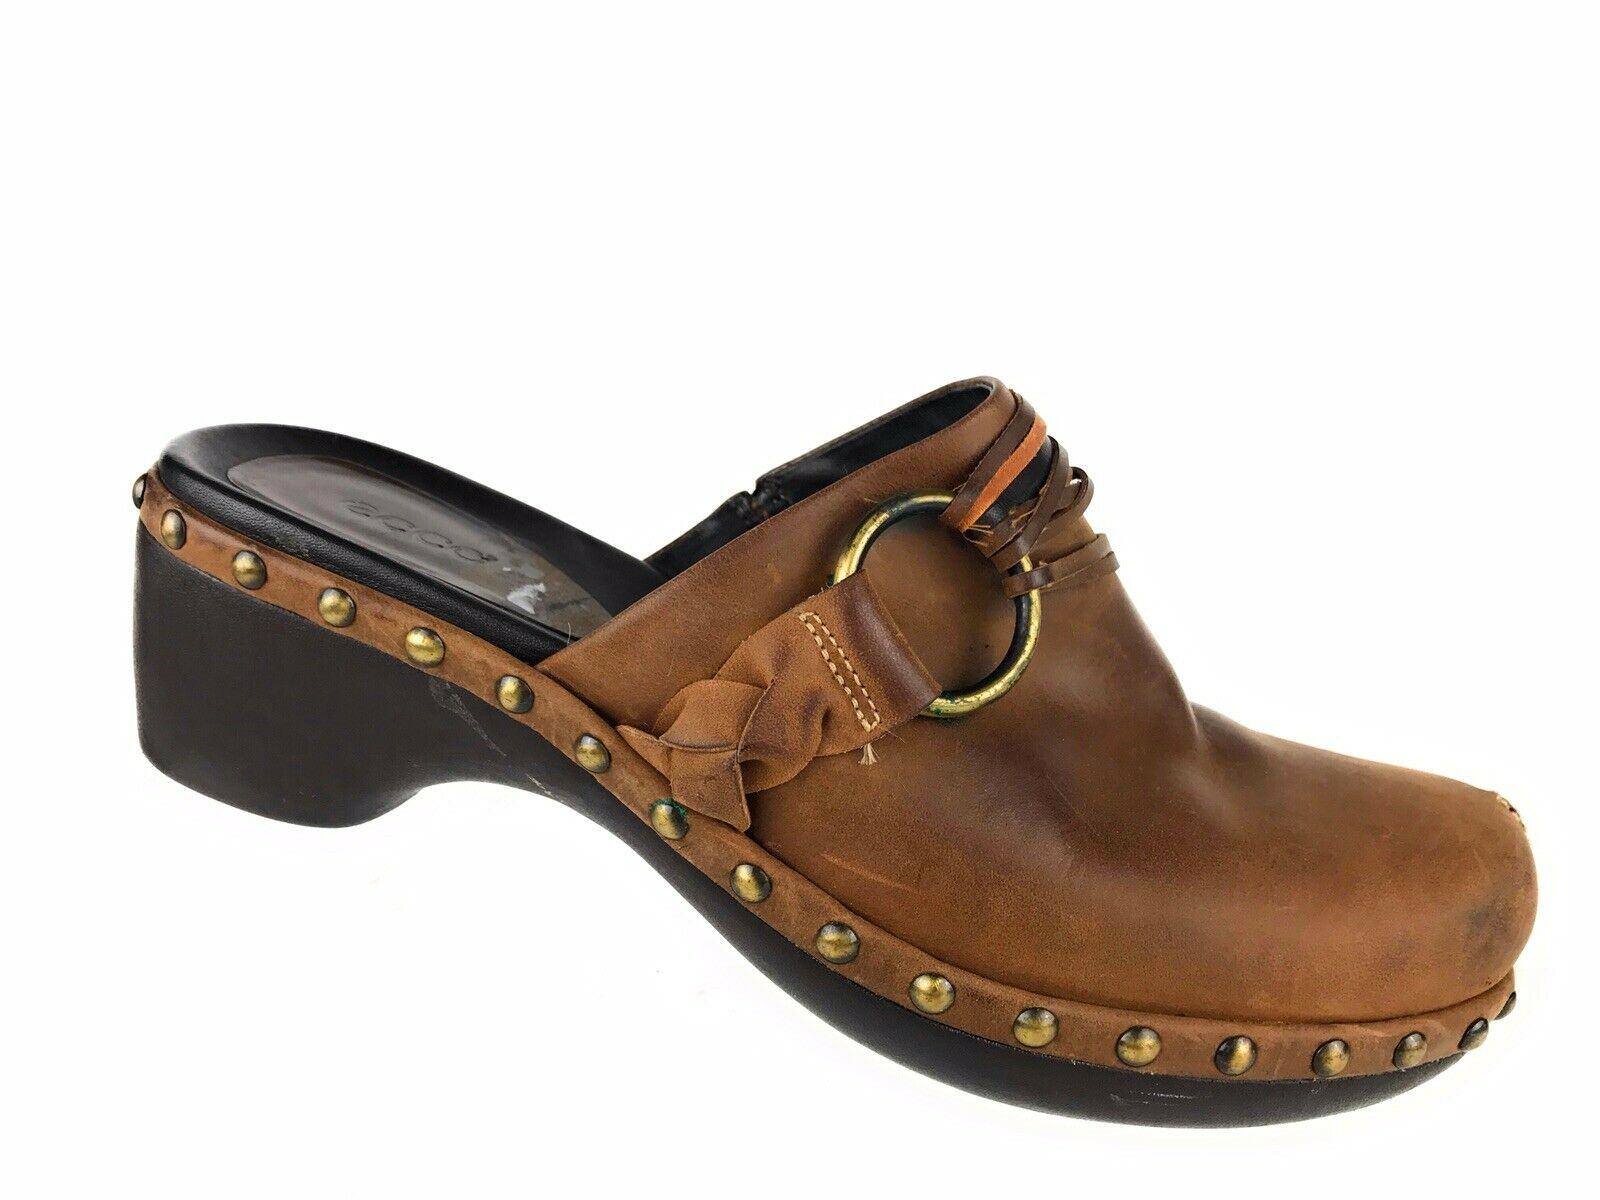 Ecco Brown Leather Studded Stud Heel Mule Clogs Slip On Women's Sz 39 US 8 8.5